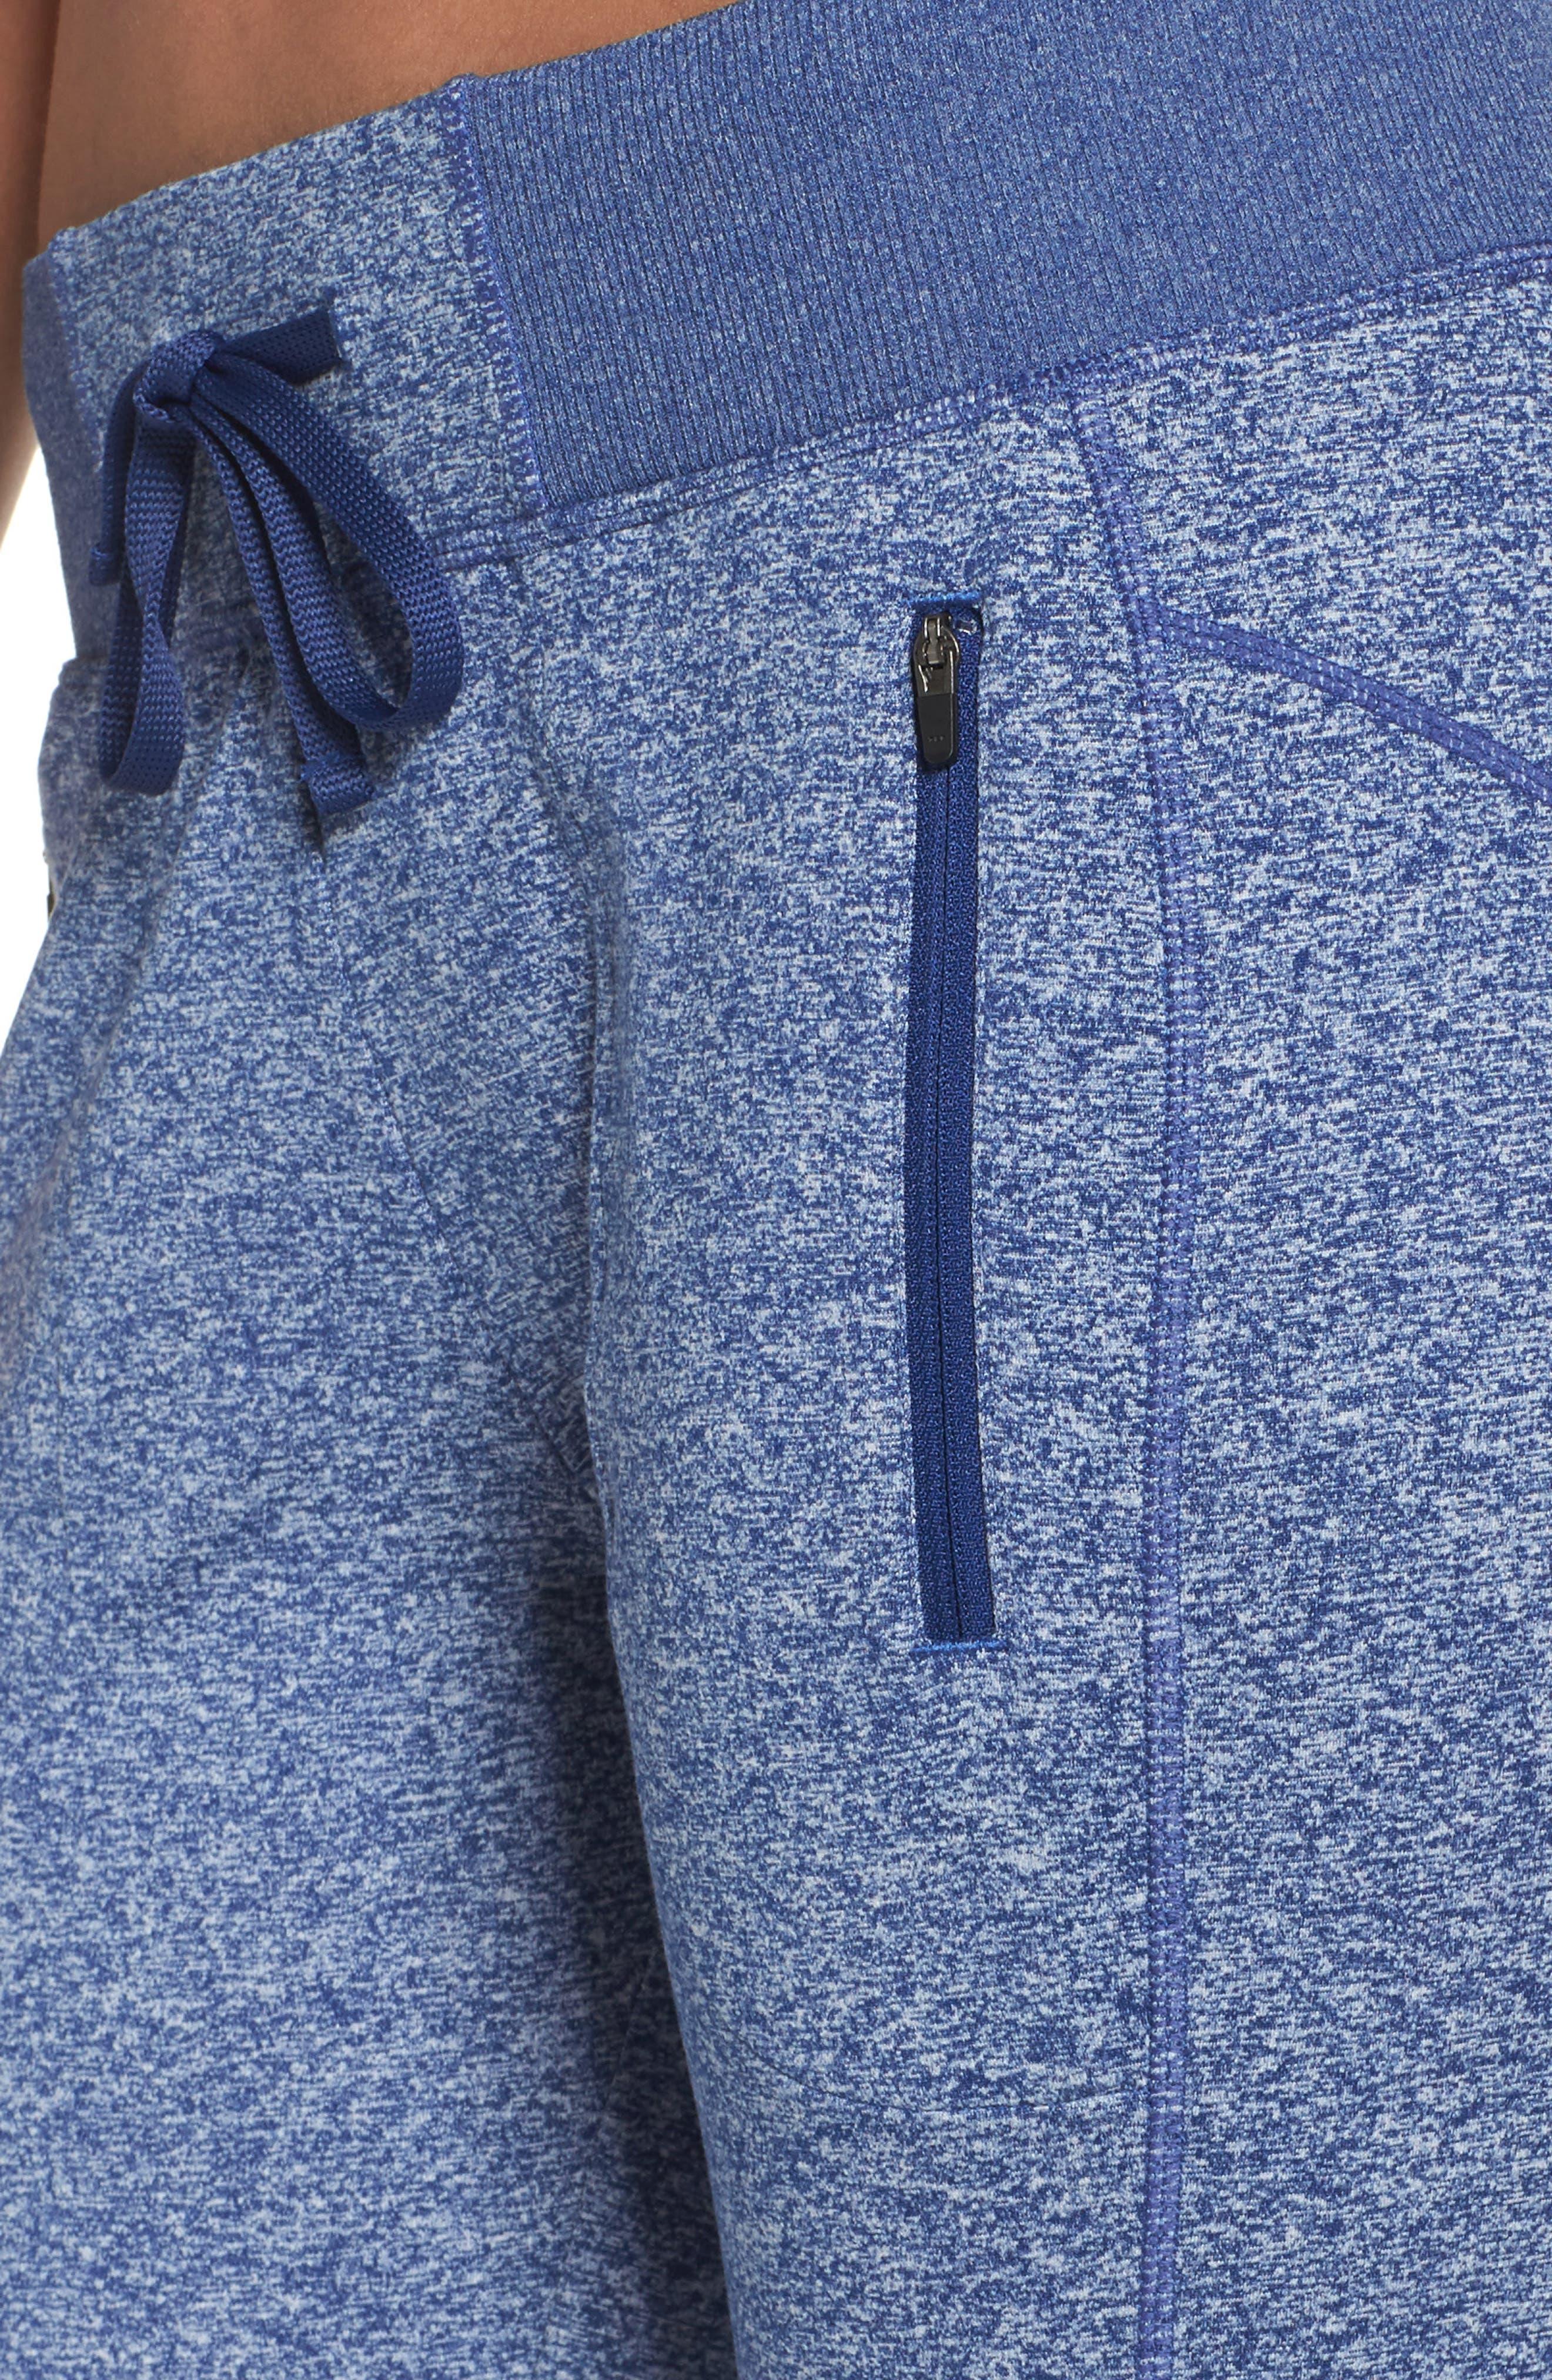 Taryn Sport Knit Pants,                             Alternate thumbnail 4, color,                             Blue Depths Melange